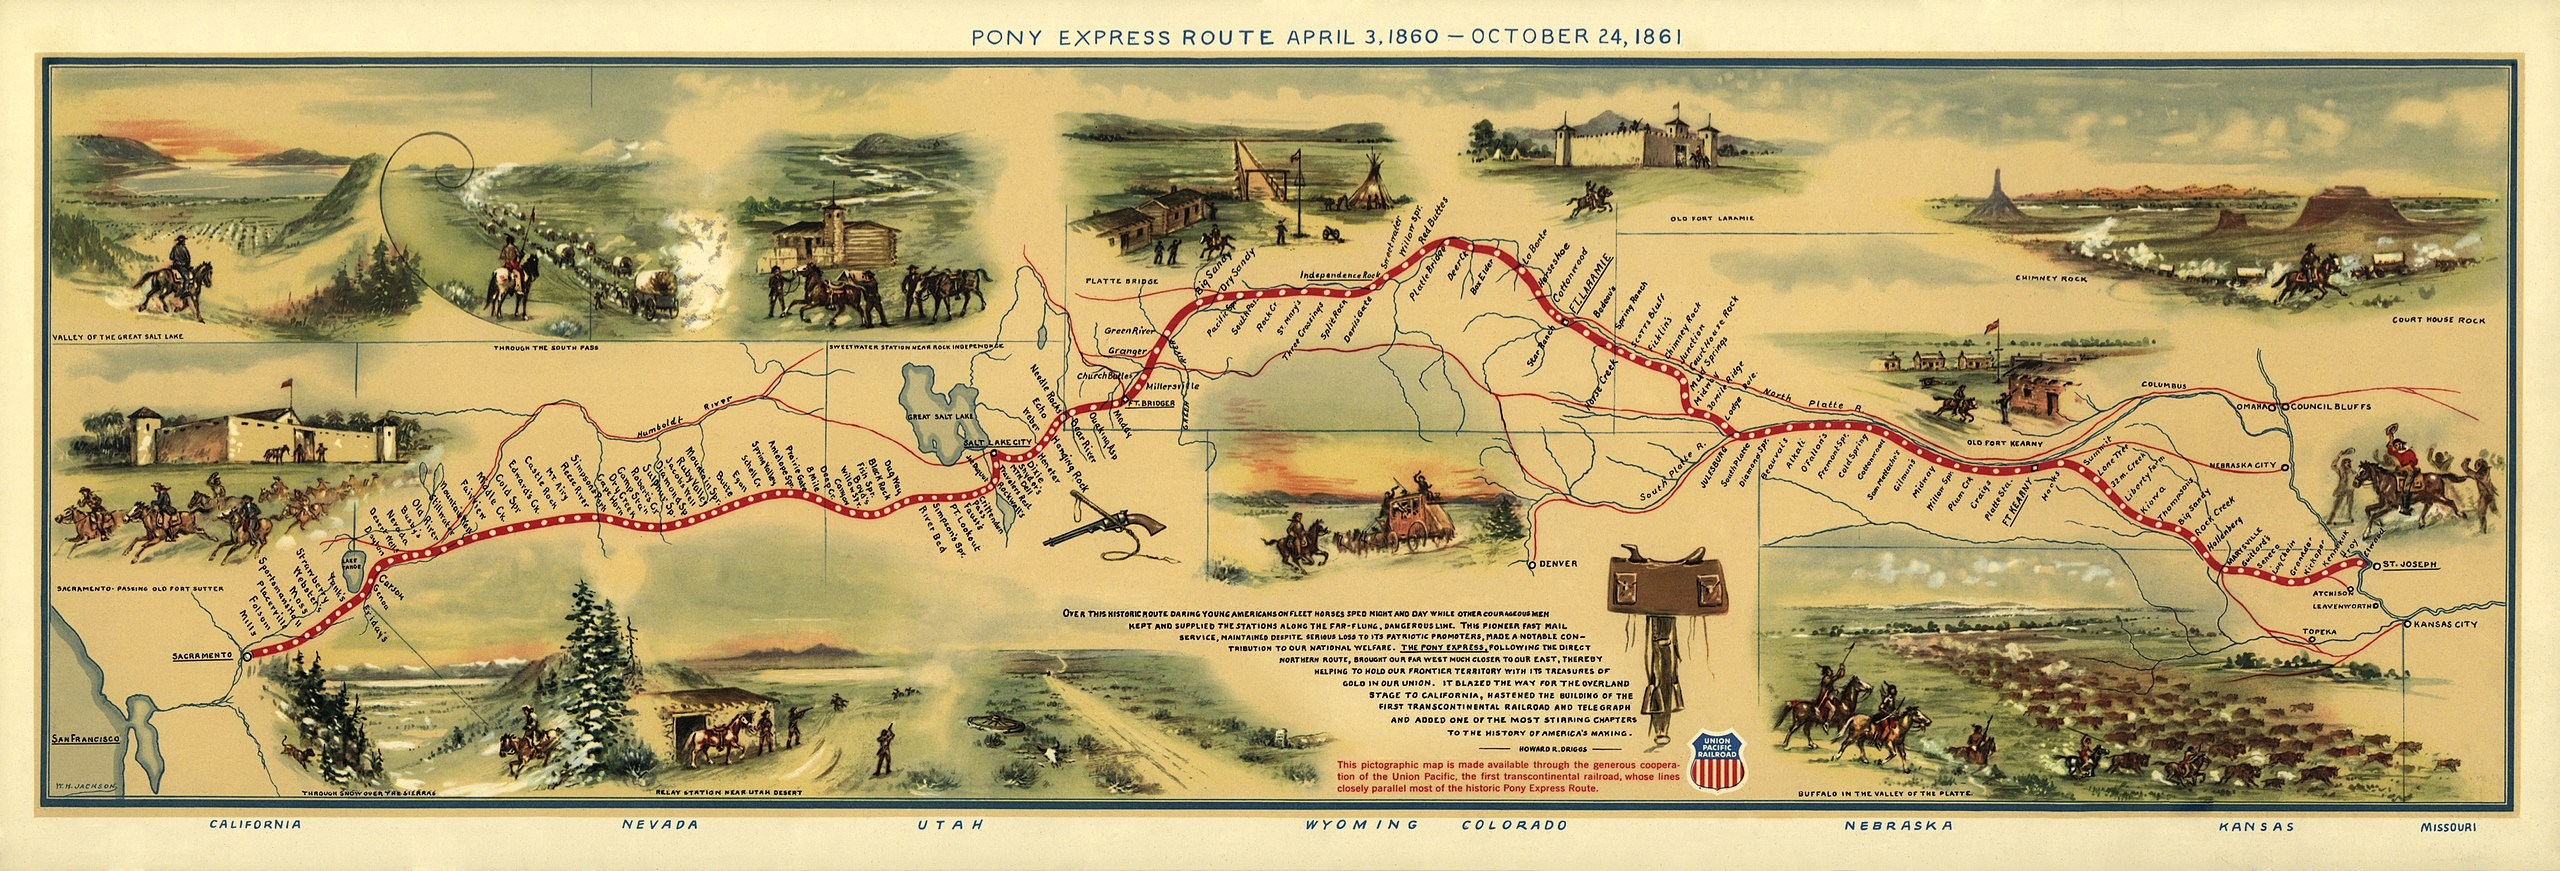 Pony Express Map (1860) by William Henry Jackson